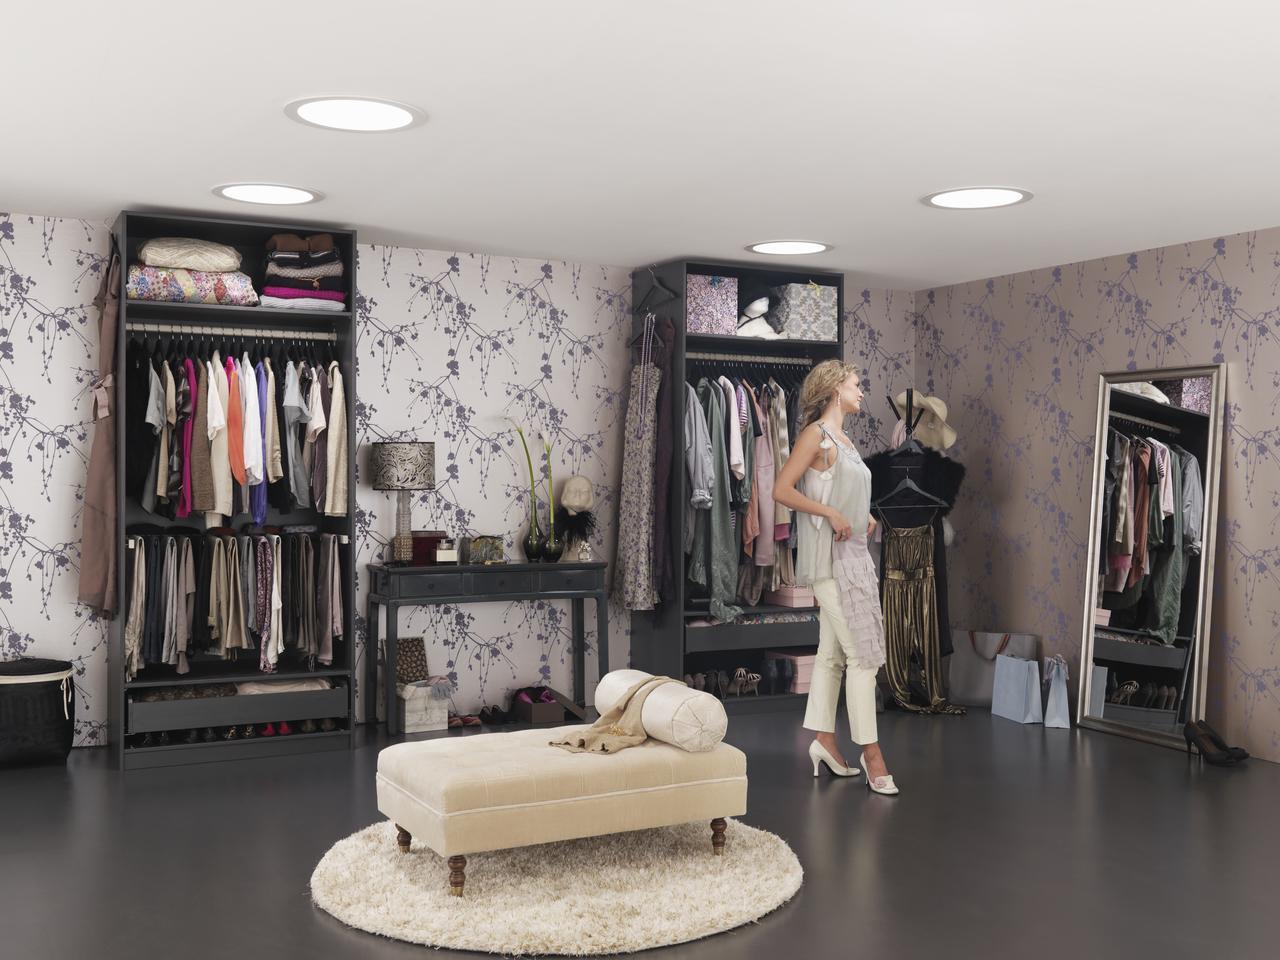 Дизайн интерьера гардеробной комнаты на мансардном этаже: фото #0030 Дизайн интерьера гардеробной на мансарде 100+ фото